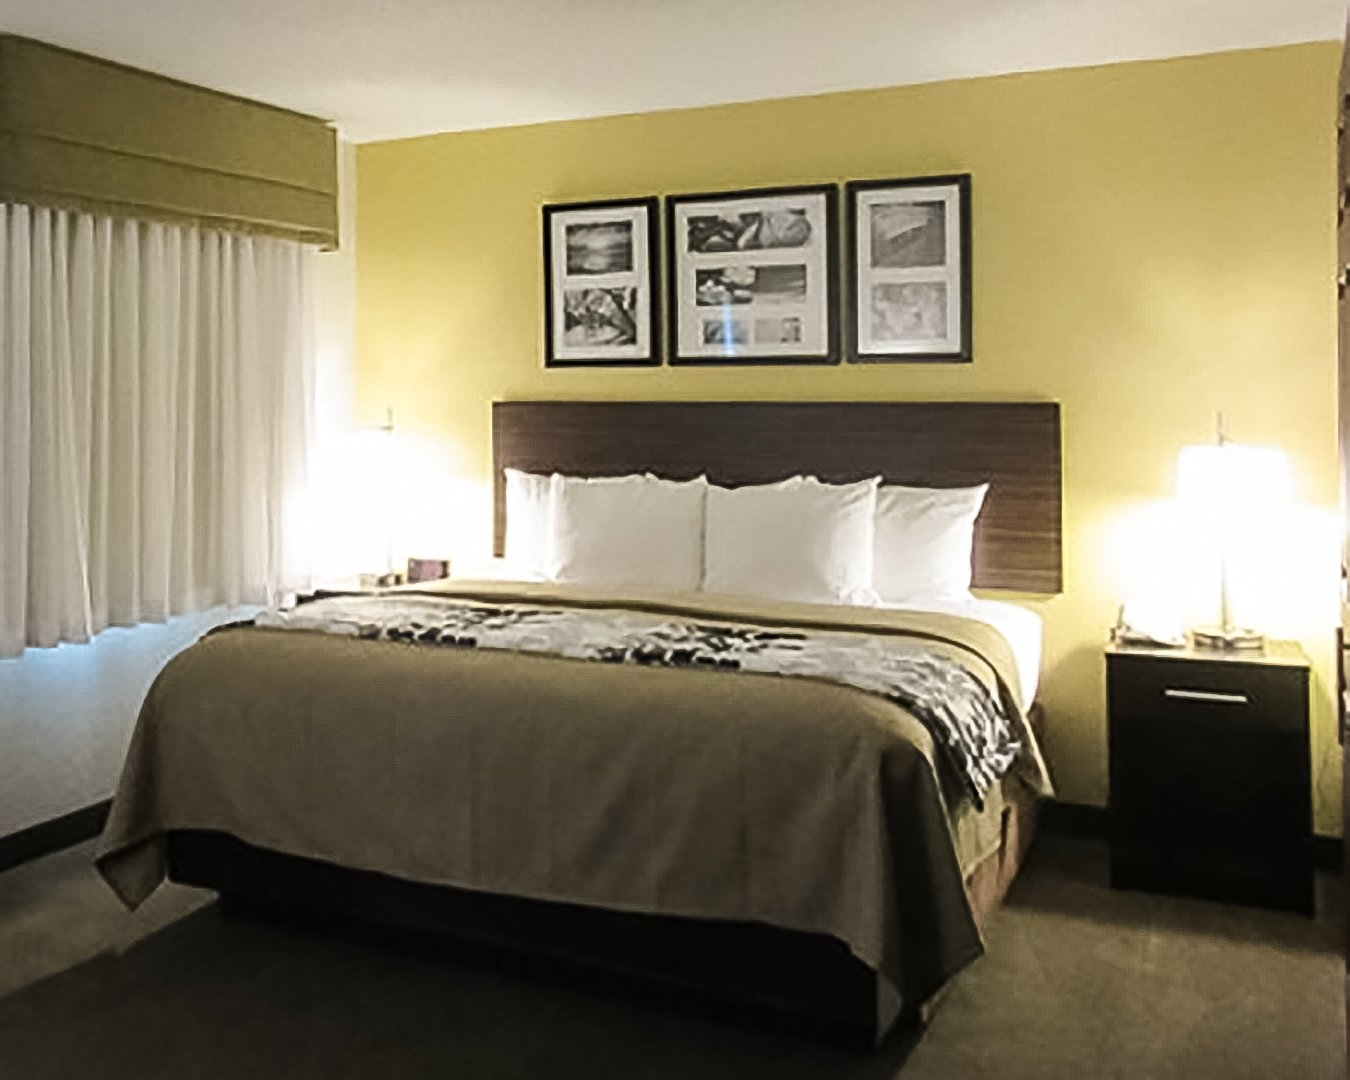 Sleep Inn Amp Suites Pittsburgh Pennsylvania Pa